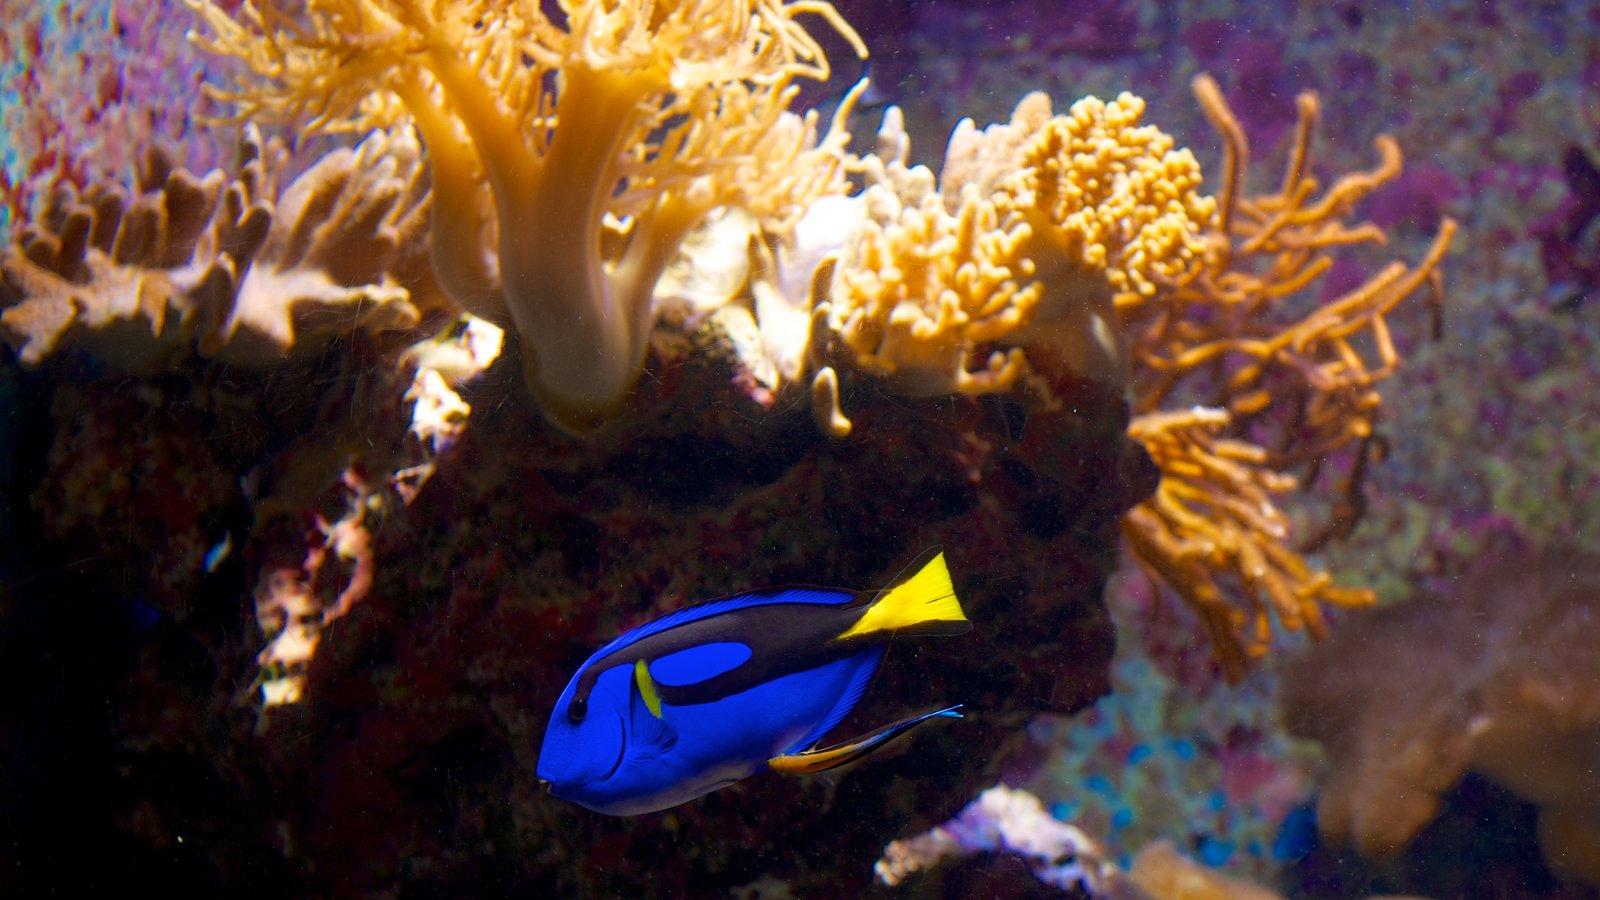 Okinawa Churaumi Aquarium featuring coral and marine life